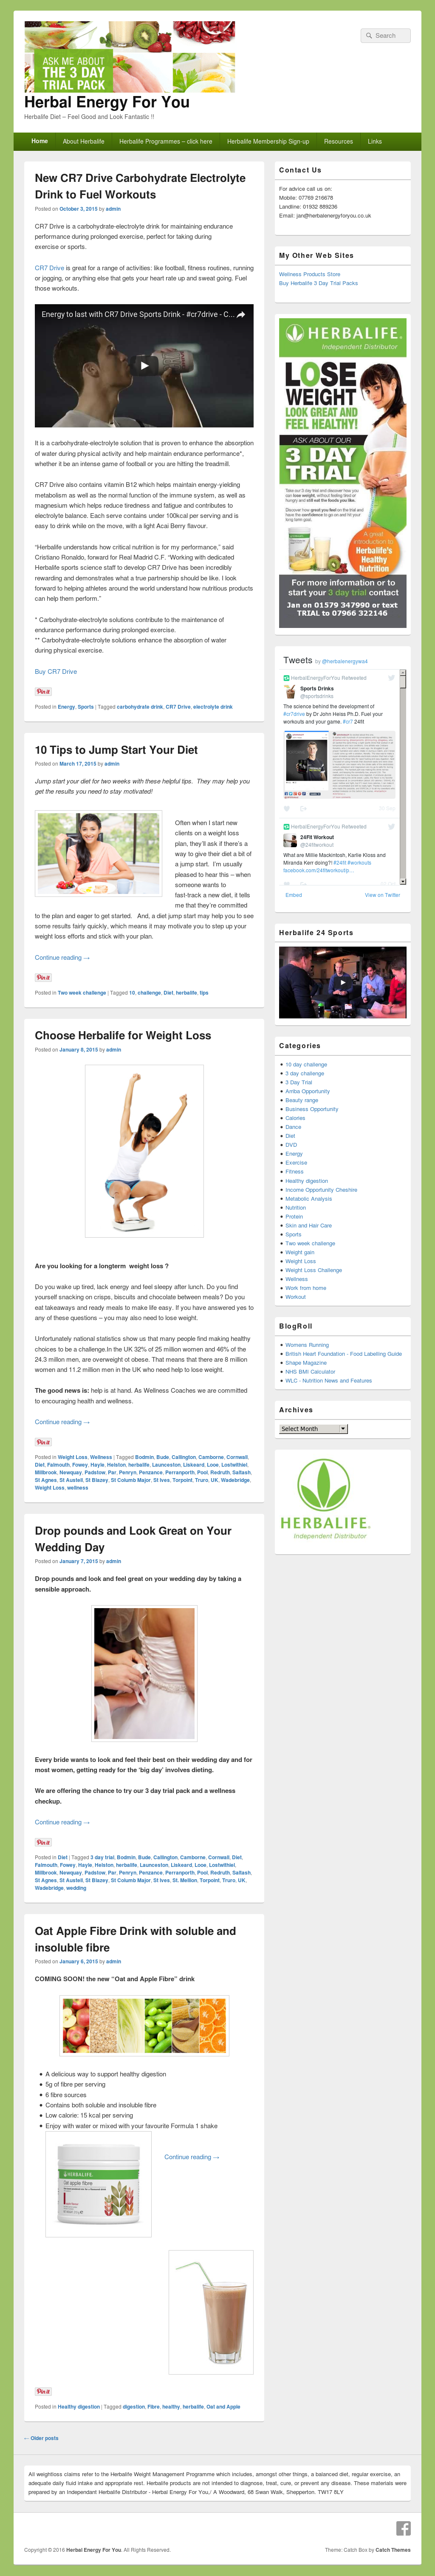 Herbal Energy For You - Independant Herbalife Distributor